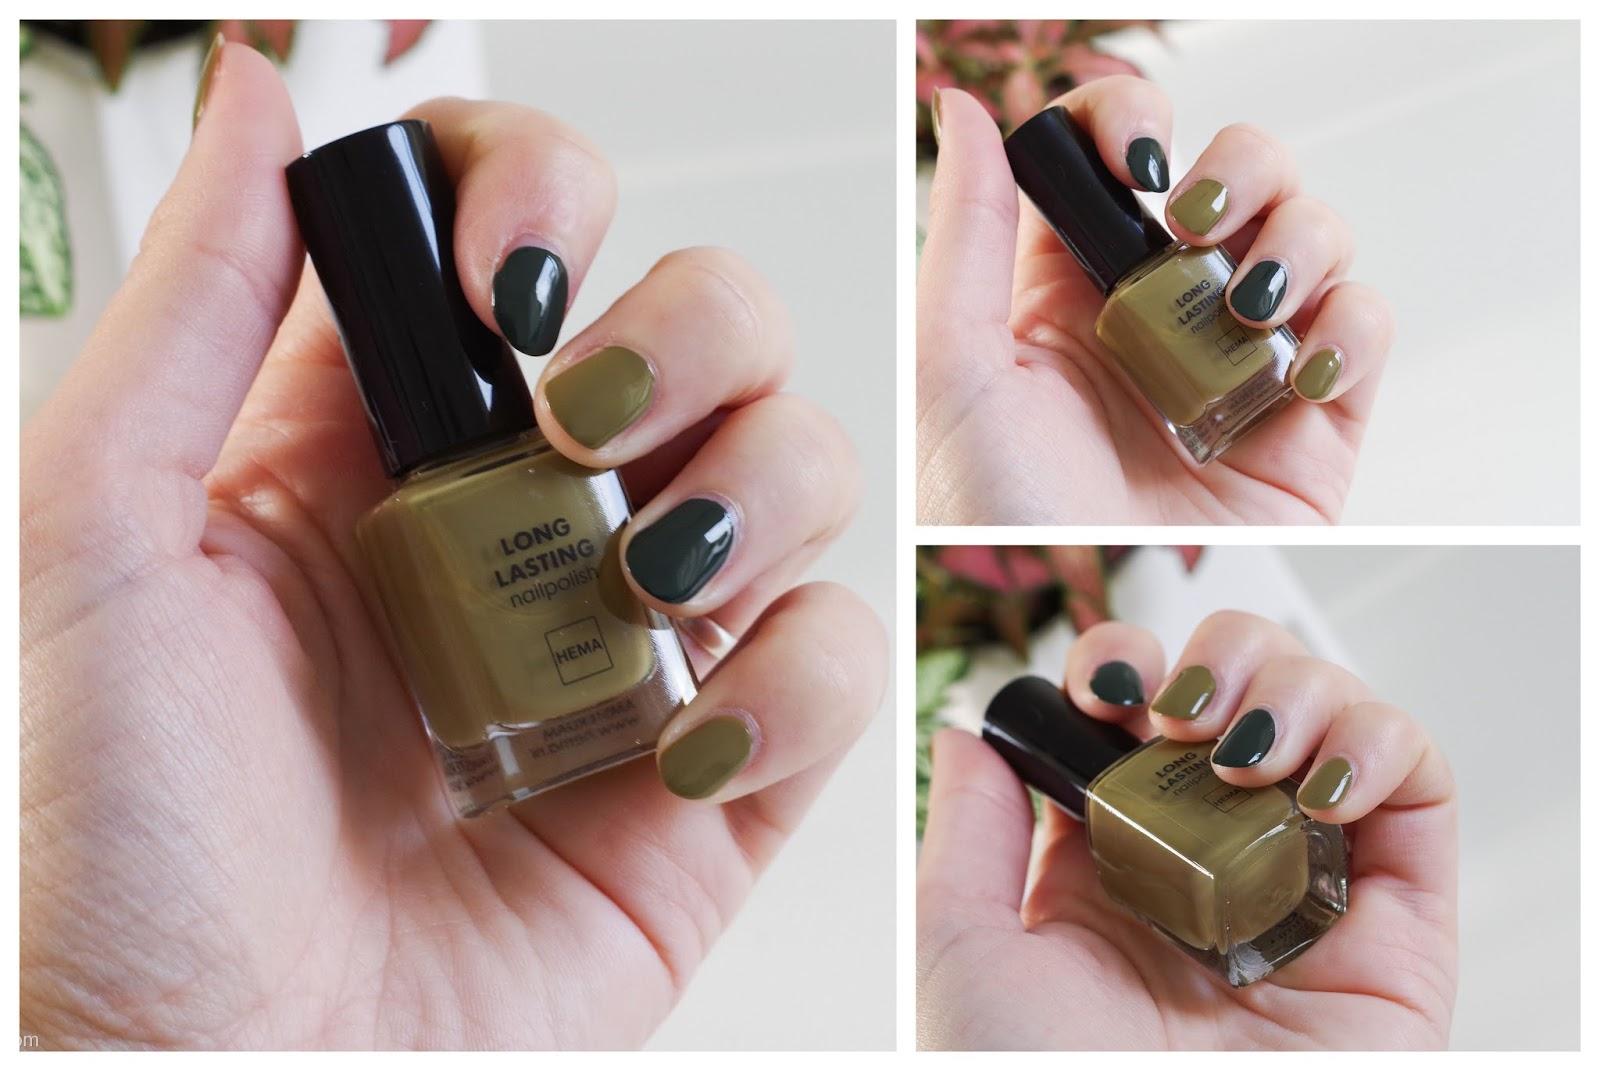 hema long lasting nailpolish nagellak poldergreen oh my olive